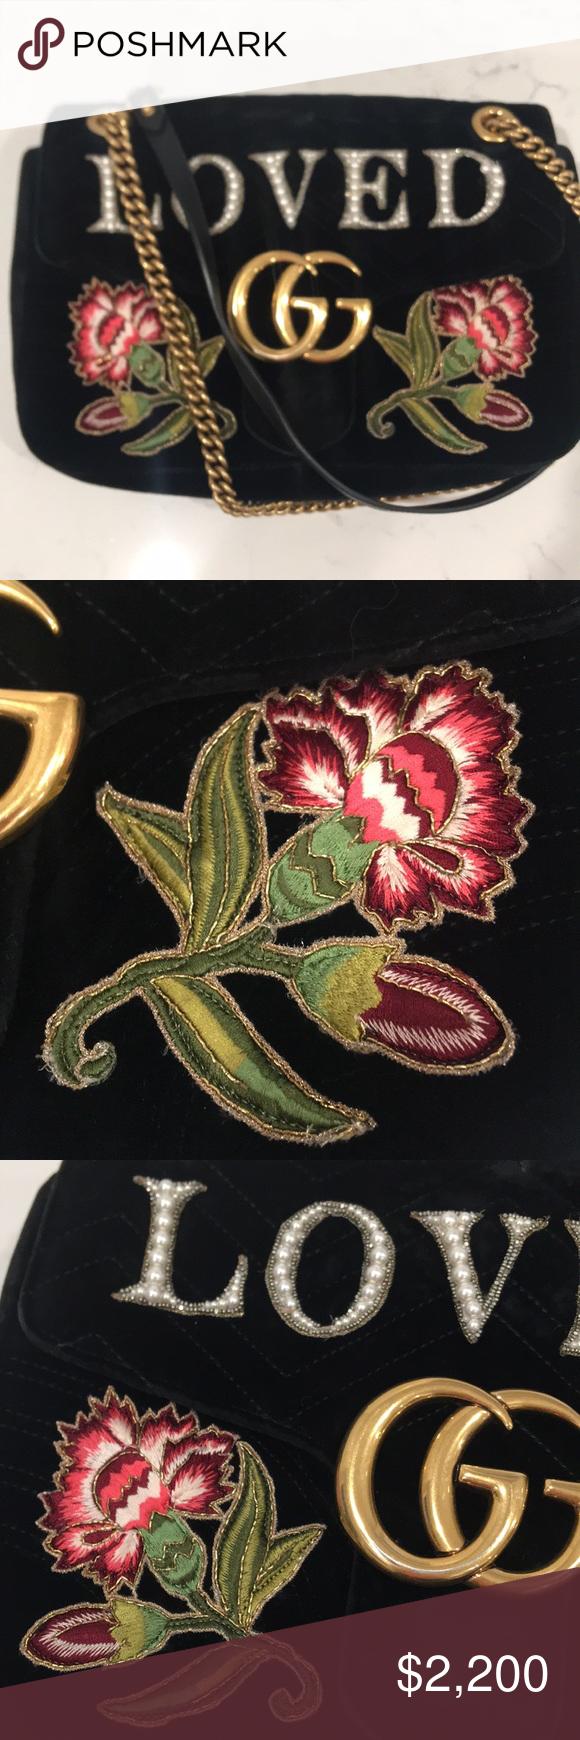 Gucci Gg Marmont Embroidered Velvet Loved Bag Embroidered Velvet Gucci